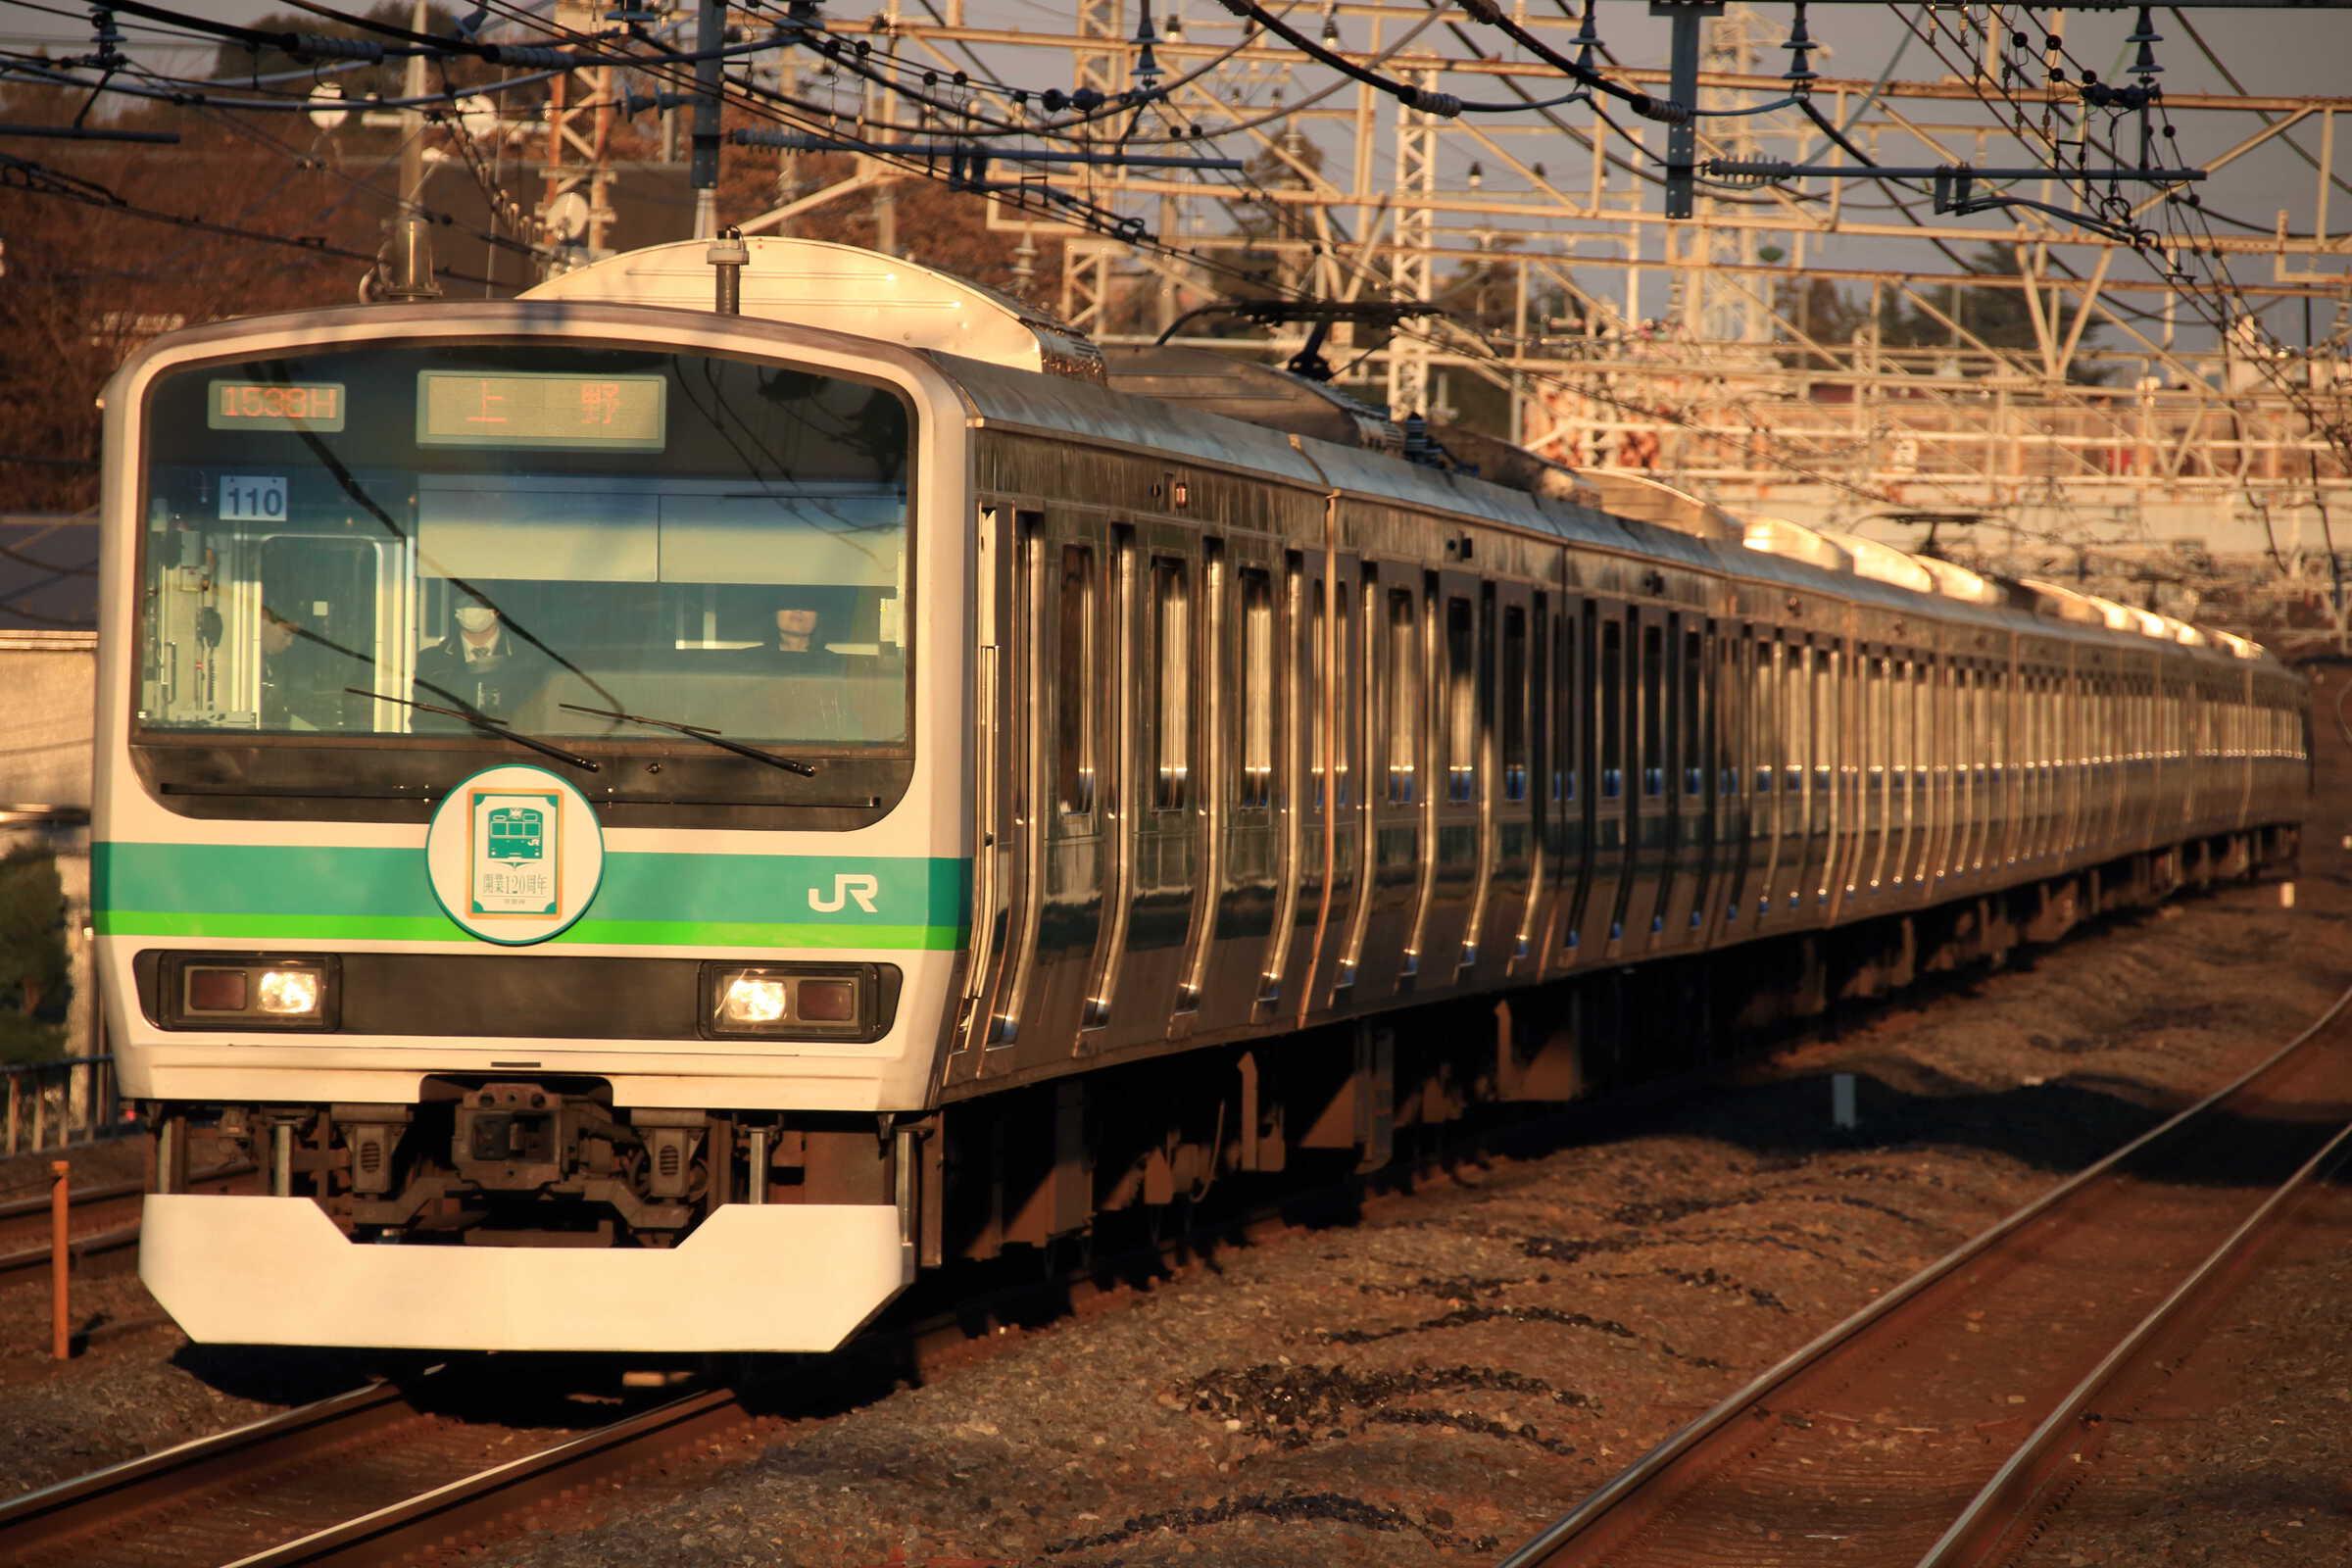 1538H E231系 東マト110編成(常磐線開業120周年ラッピング&ヘッドマーク付き)